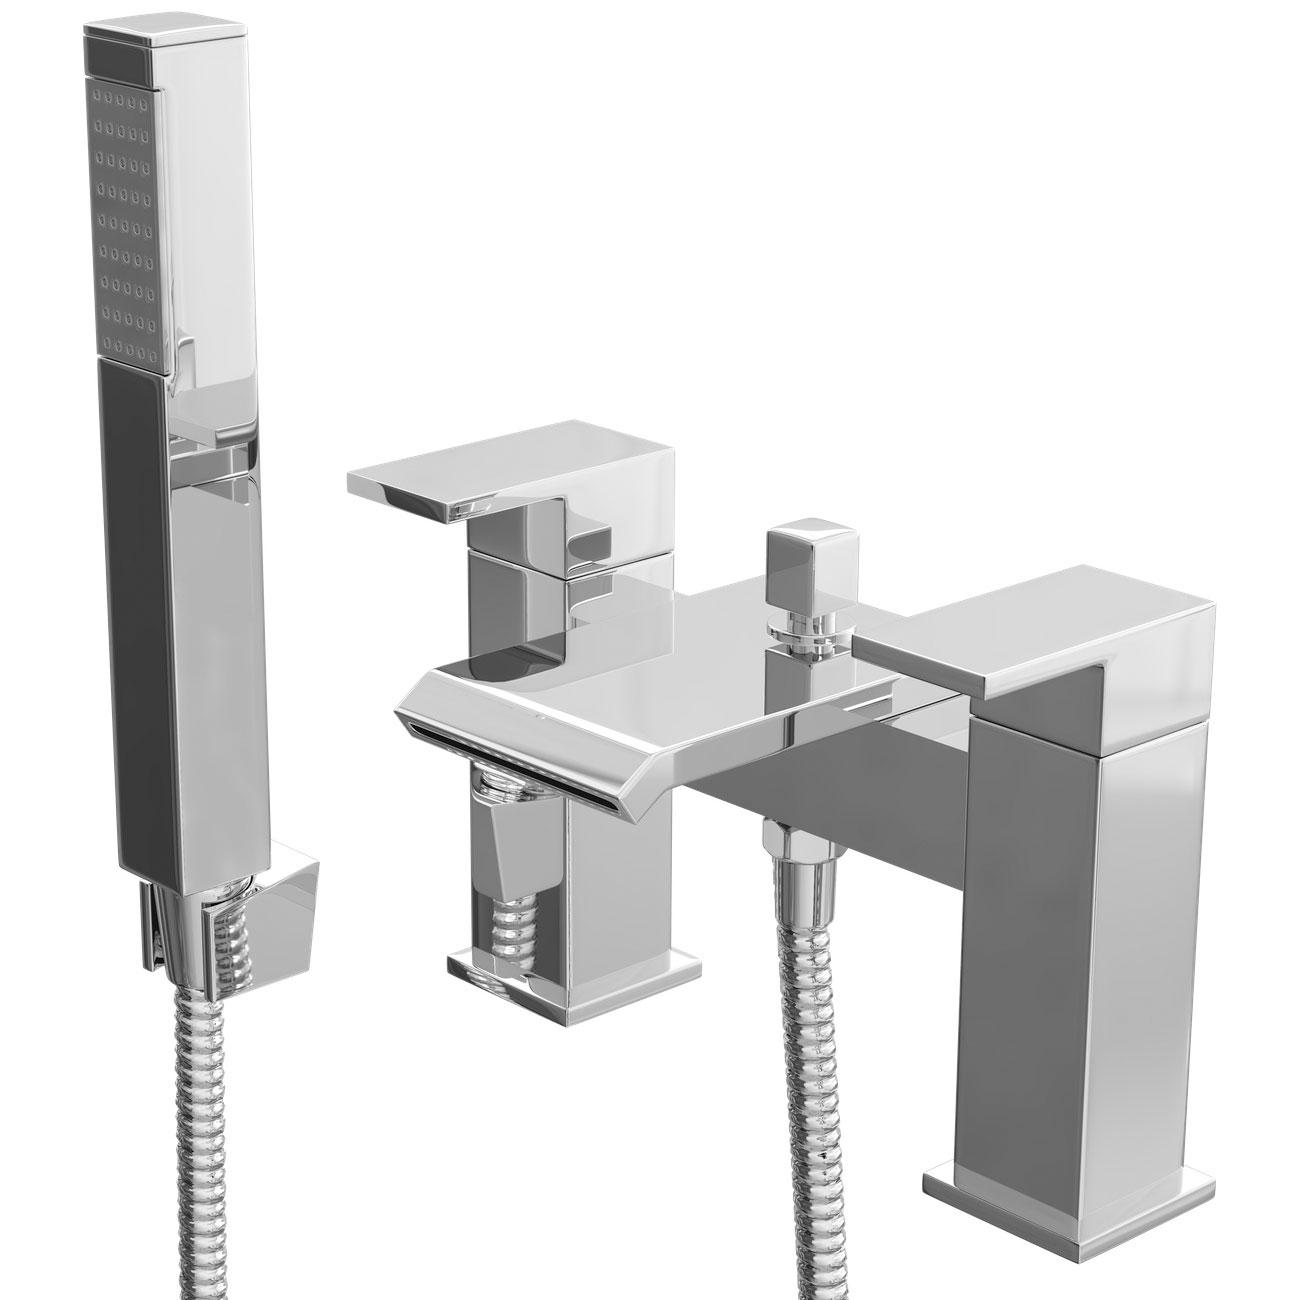 Cali Fazenda Waterfall Bath Shower Mixer Tap - Deck Mounted - Chrome